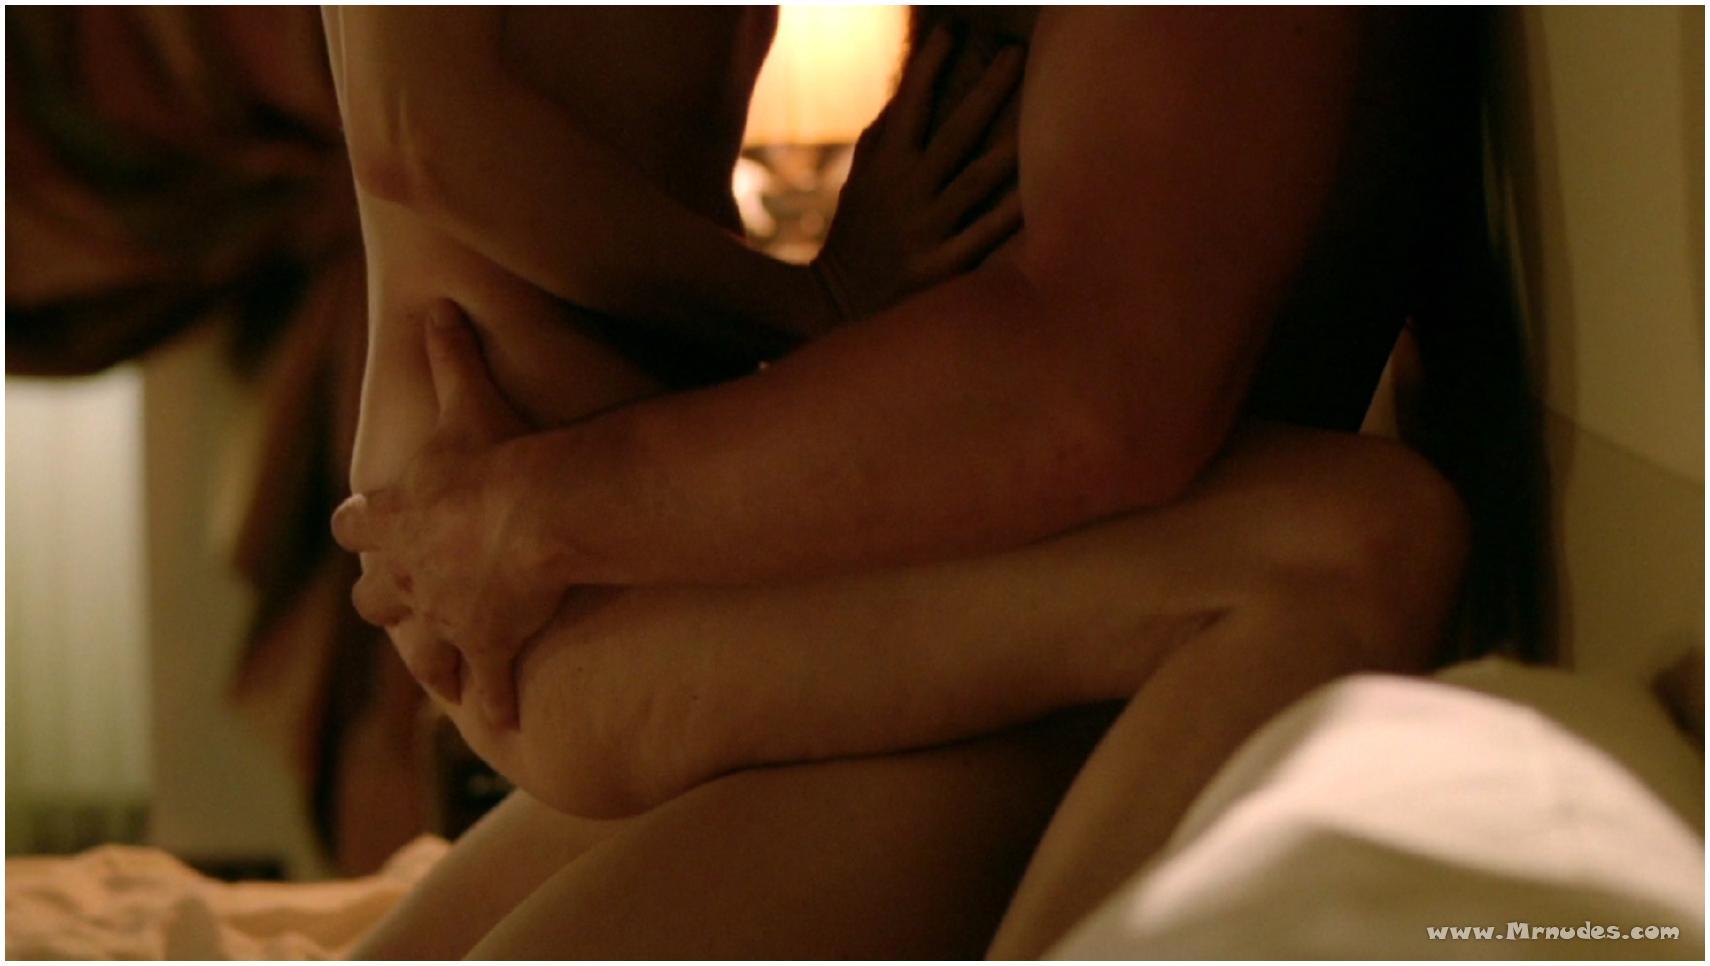 Natalia avelon nude video strange